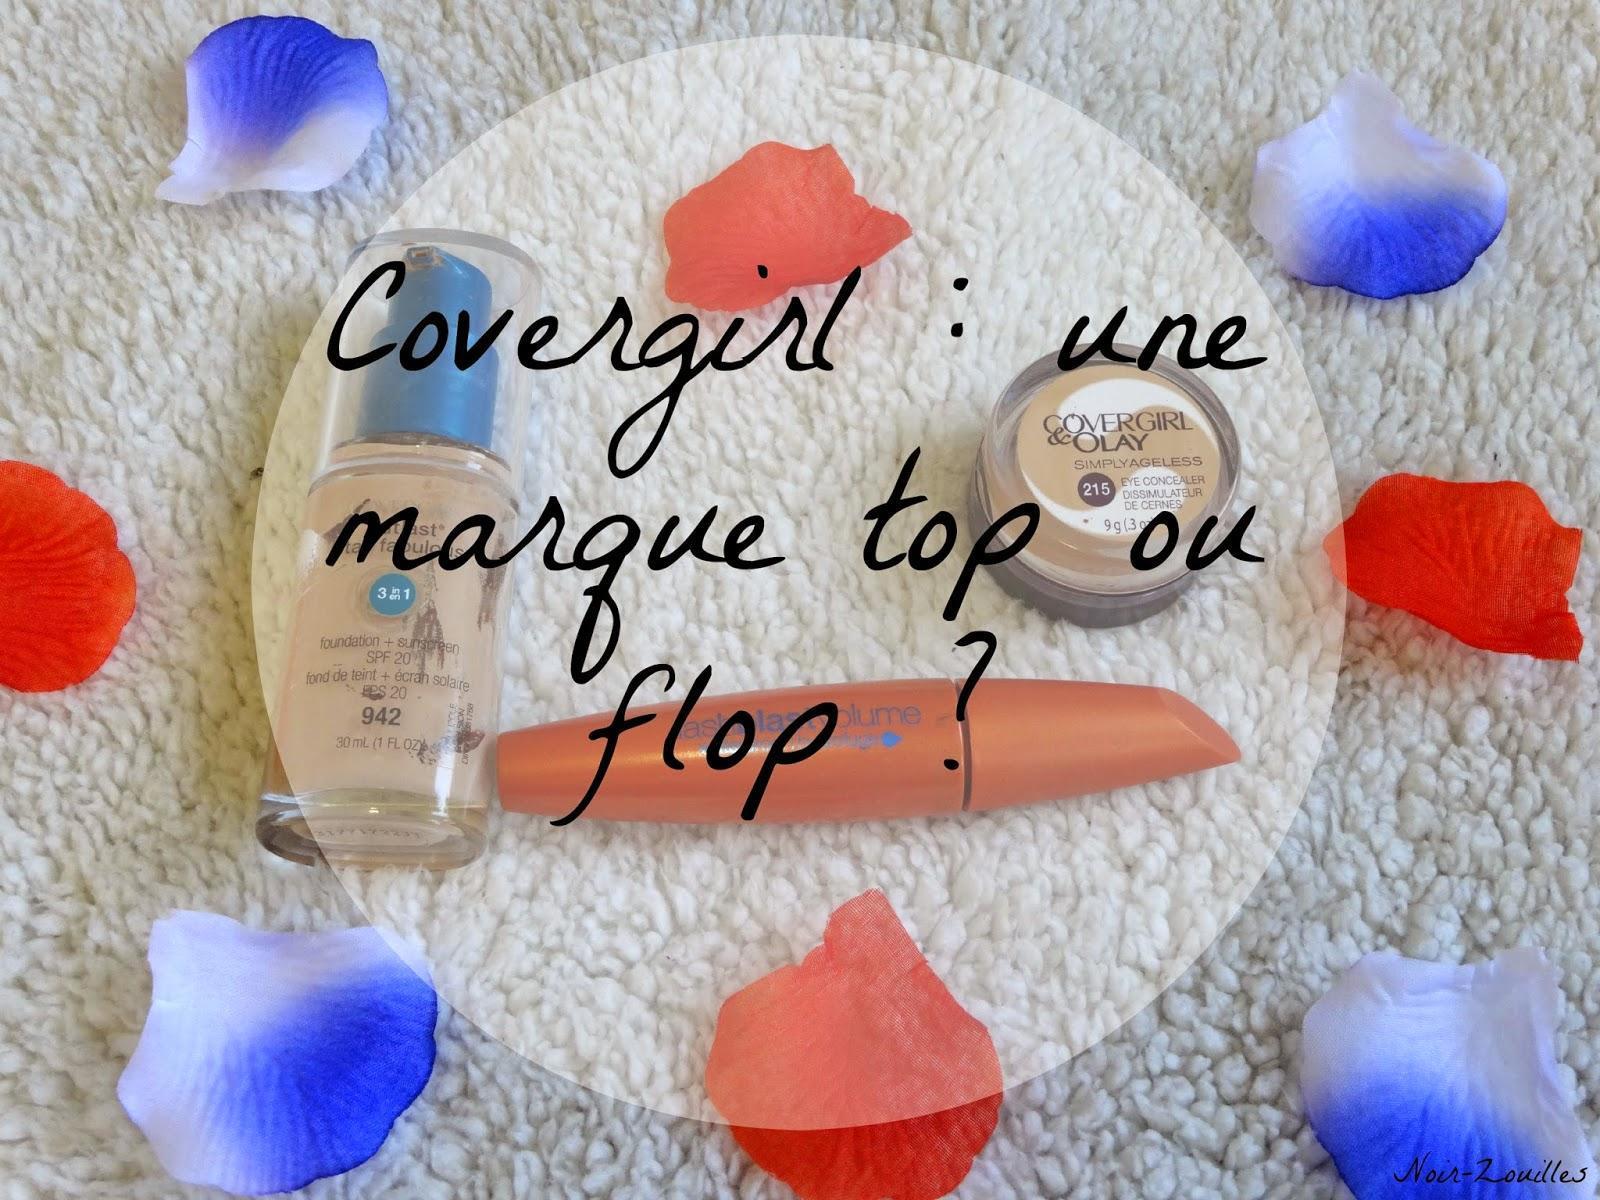 Covergirl : une marque top ou flop ?